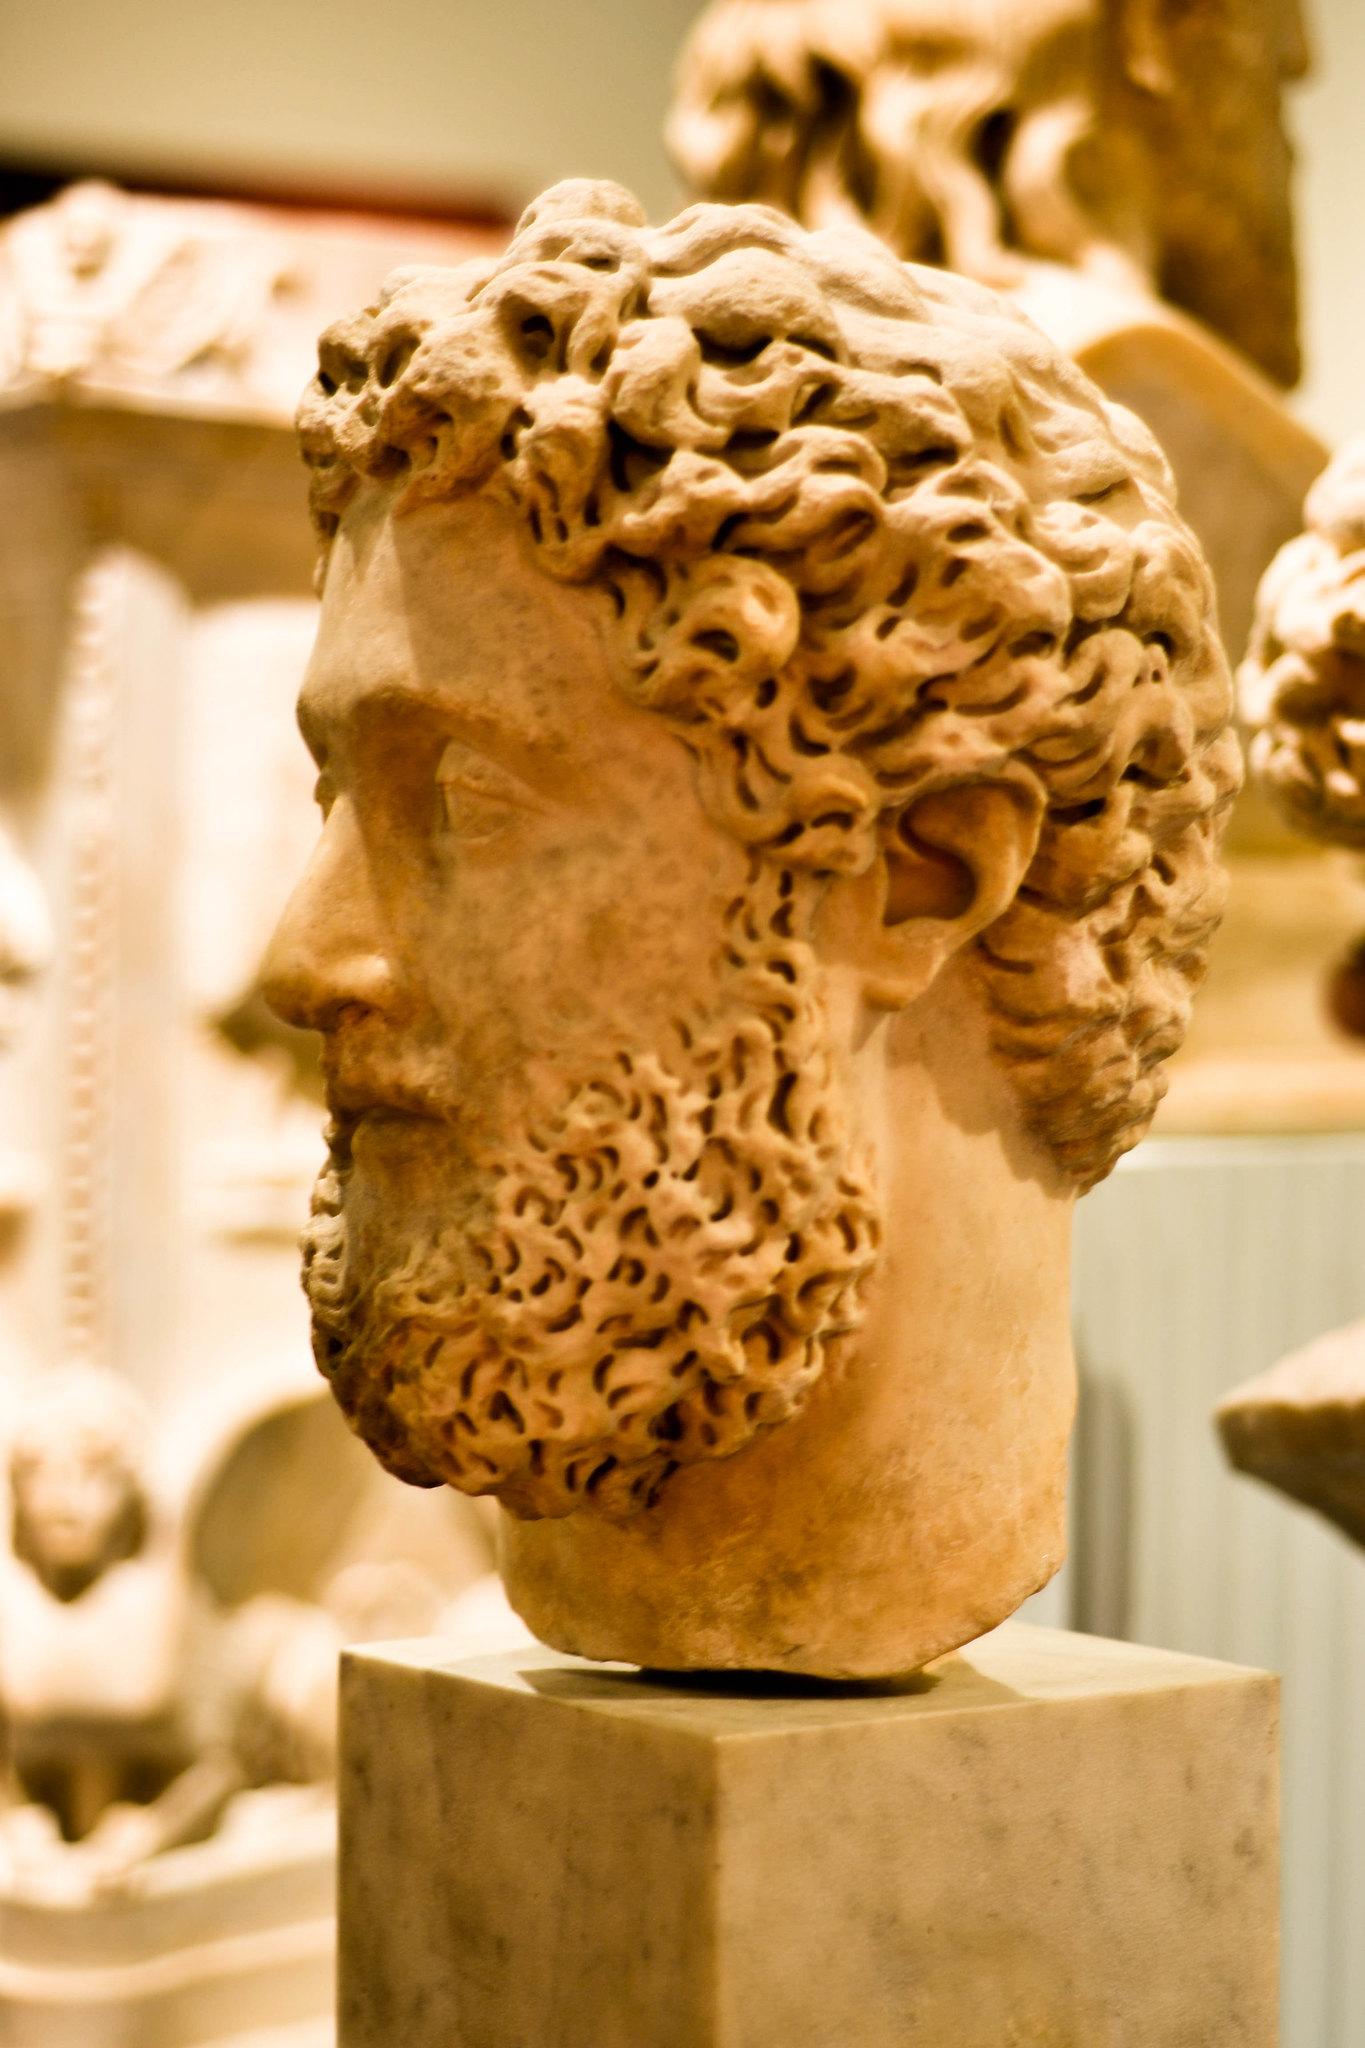 Commodus AD 185-190